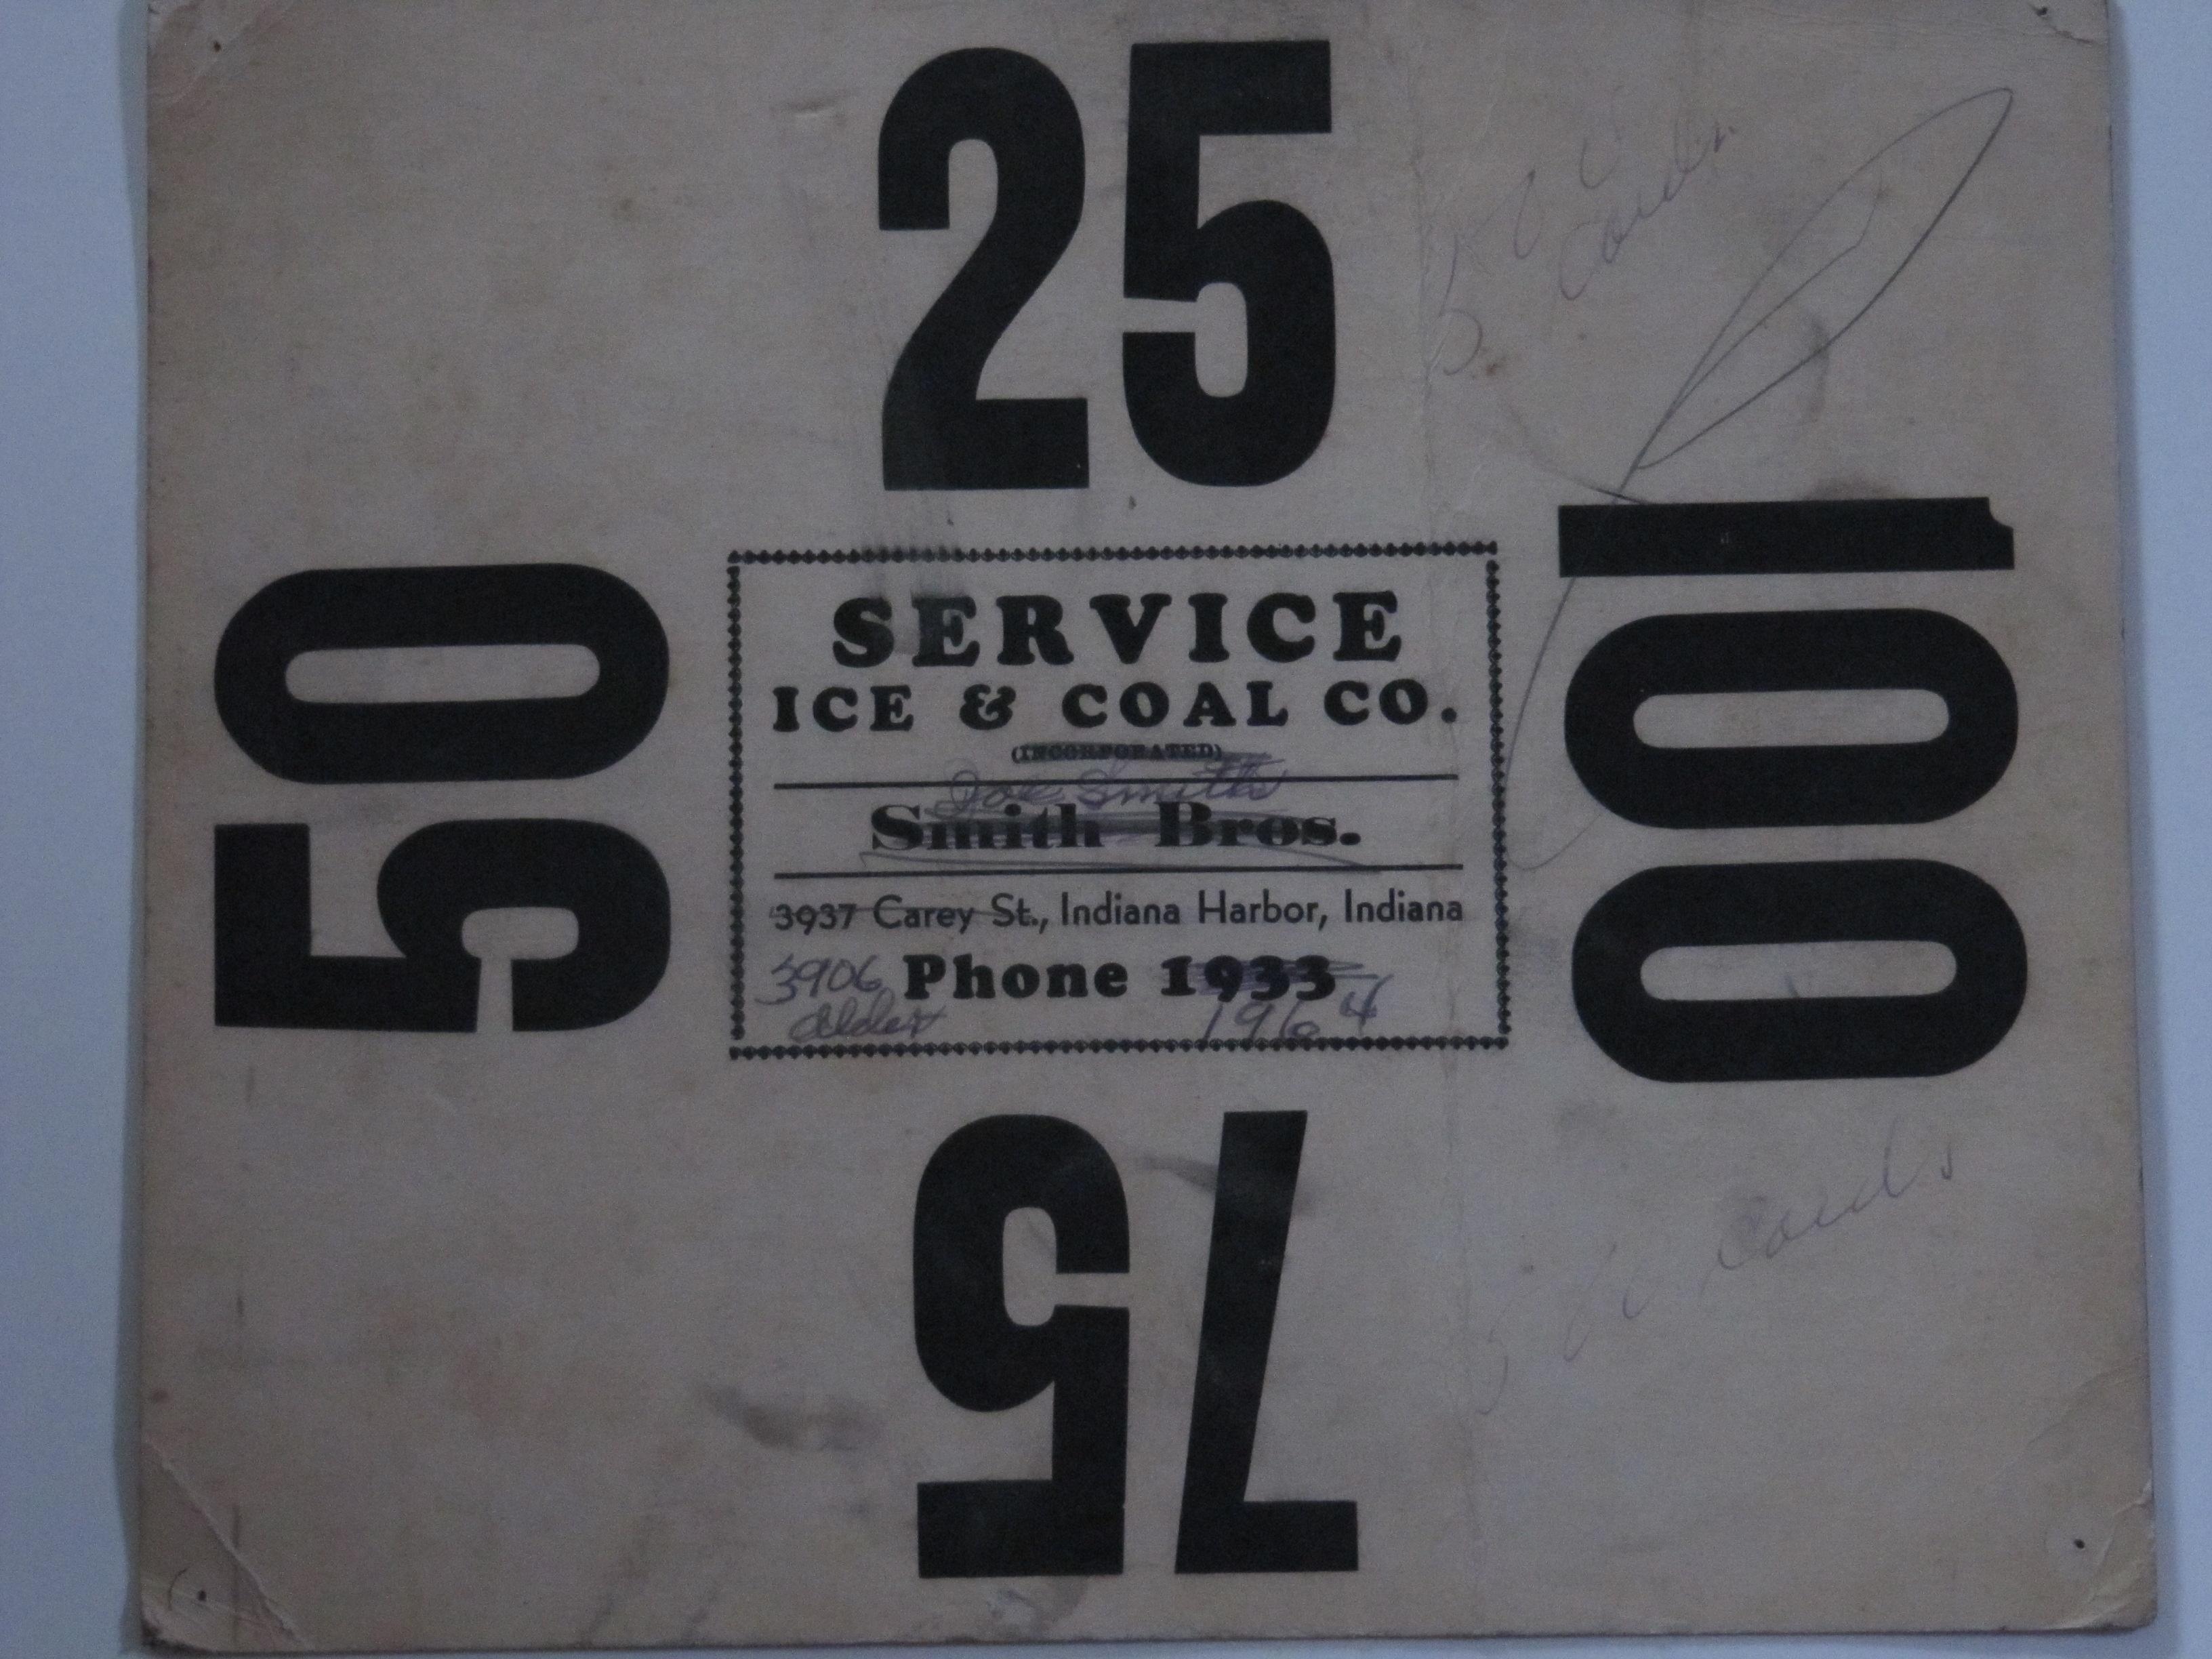 Service Ice & Coal Co.